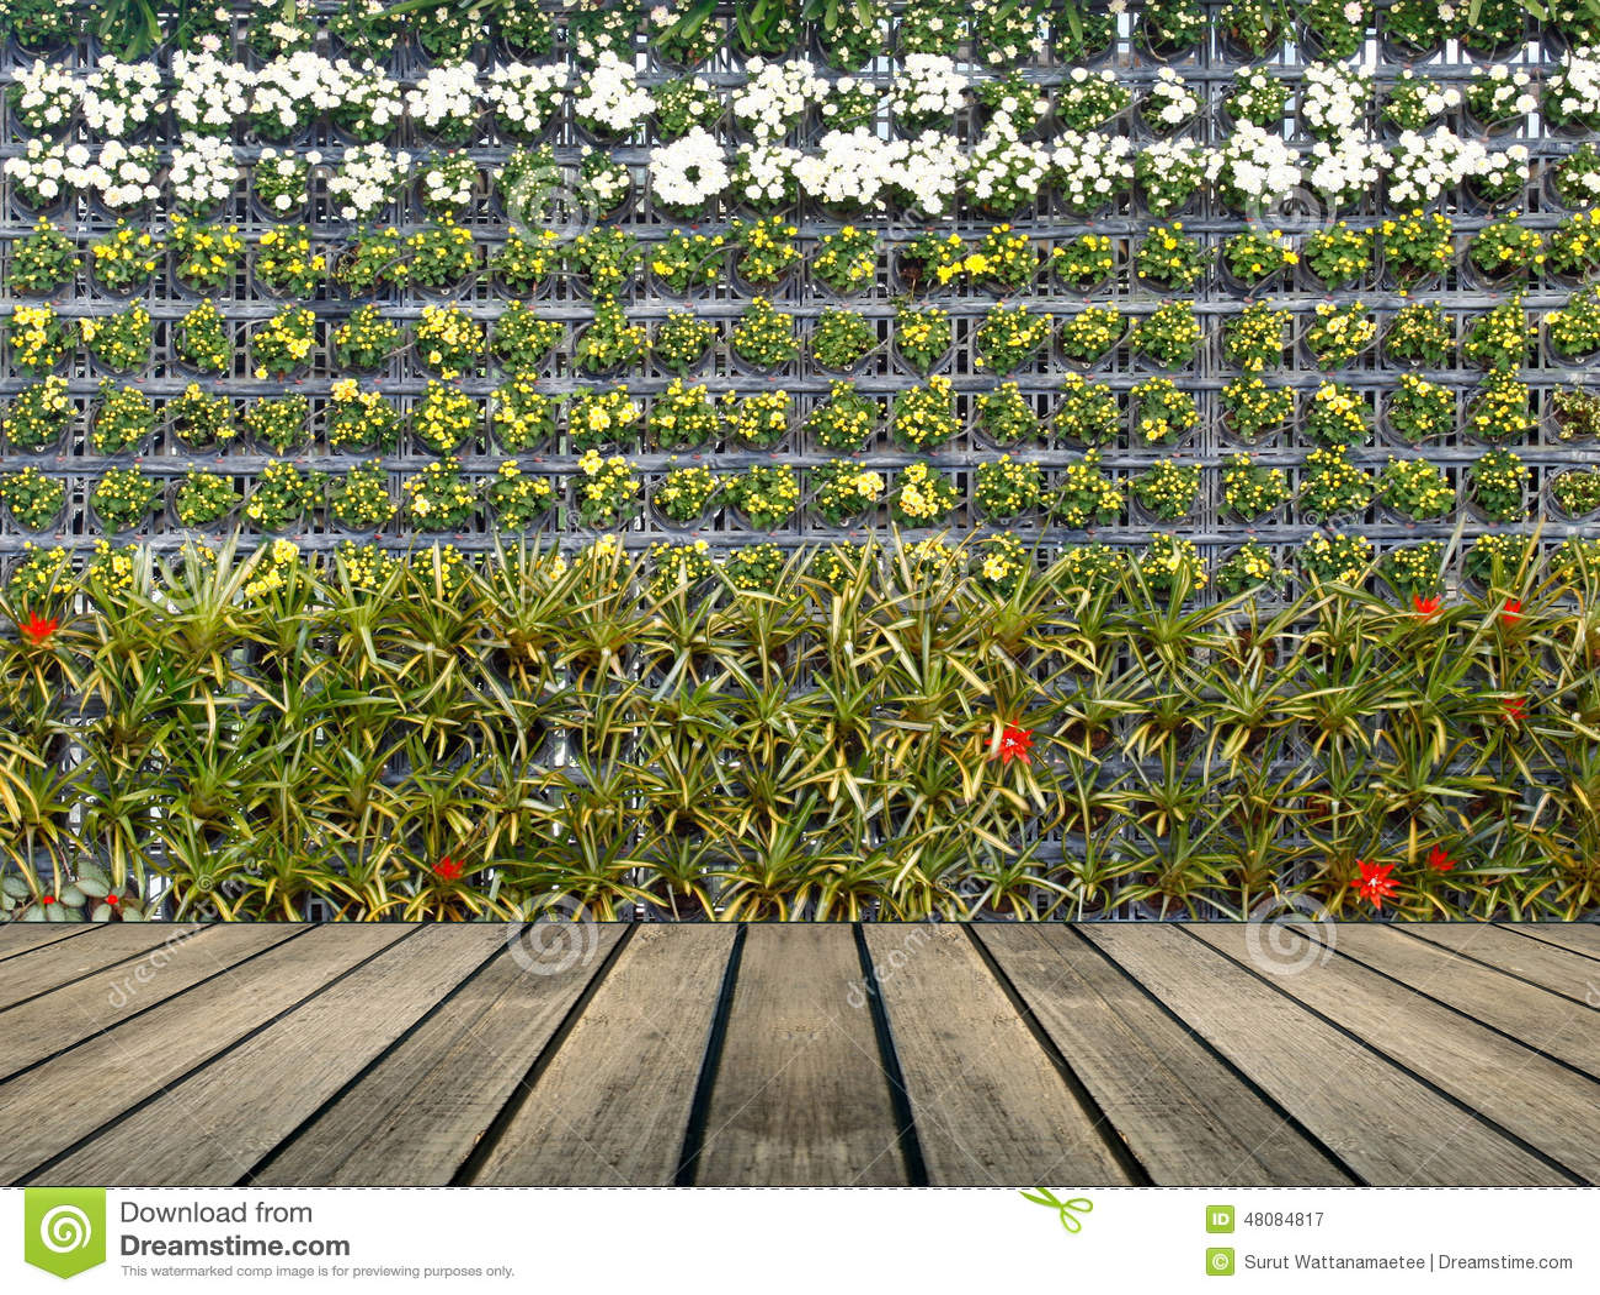 Flower wall vertical garden stock photo image 48084817 for Flower wall garden